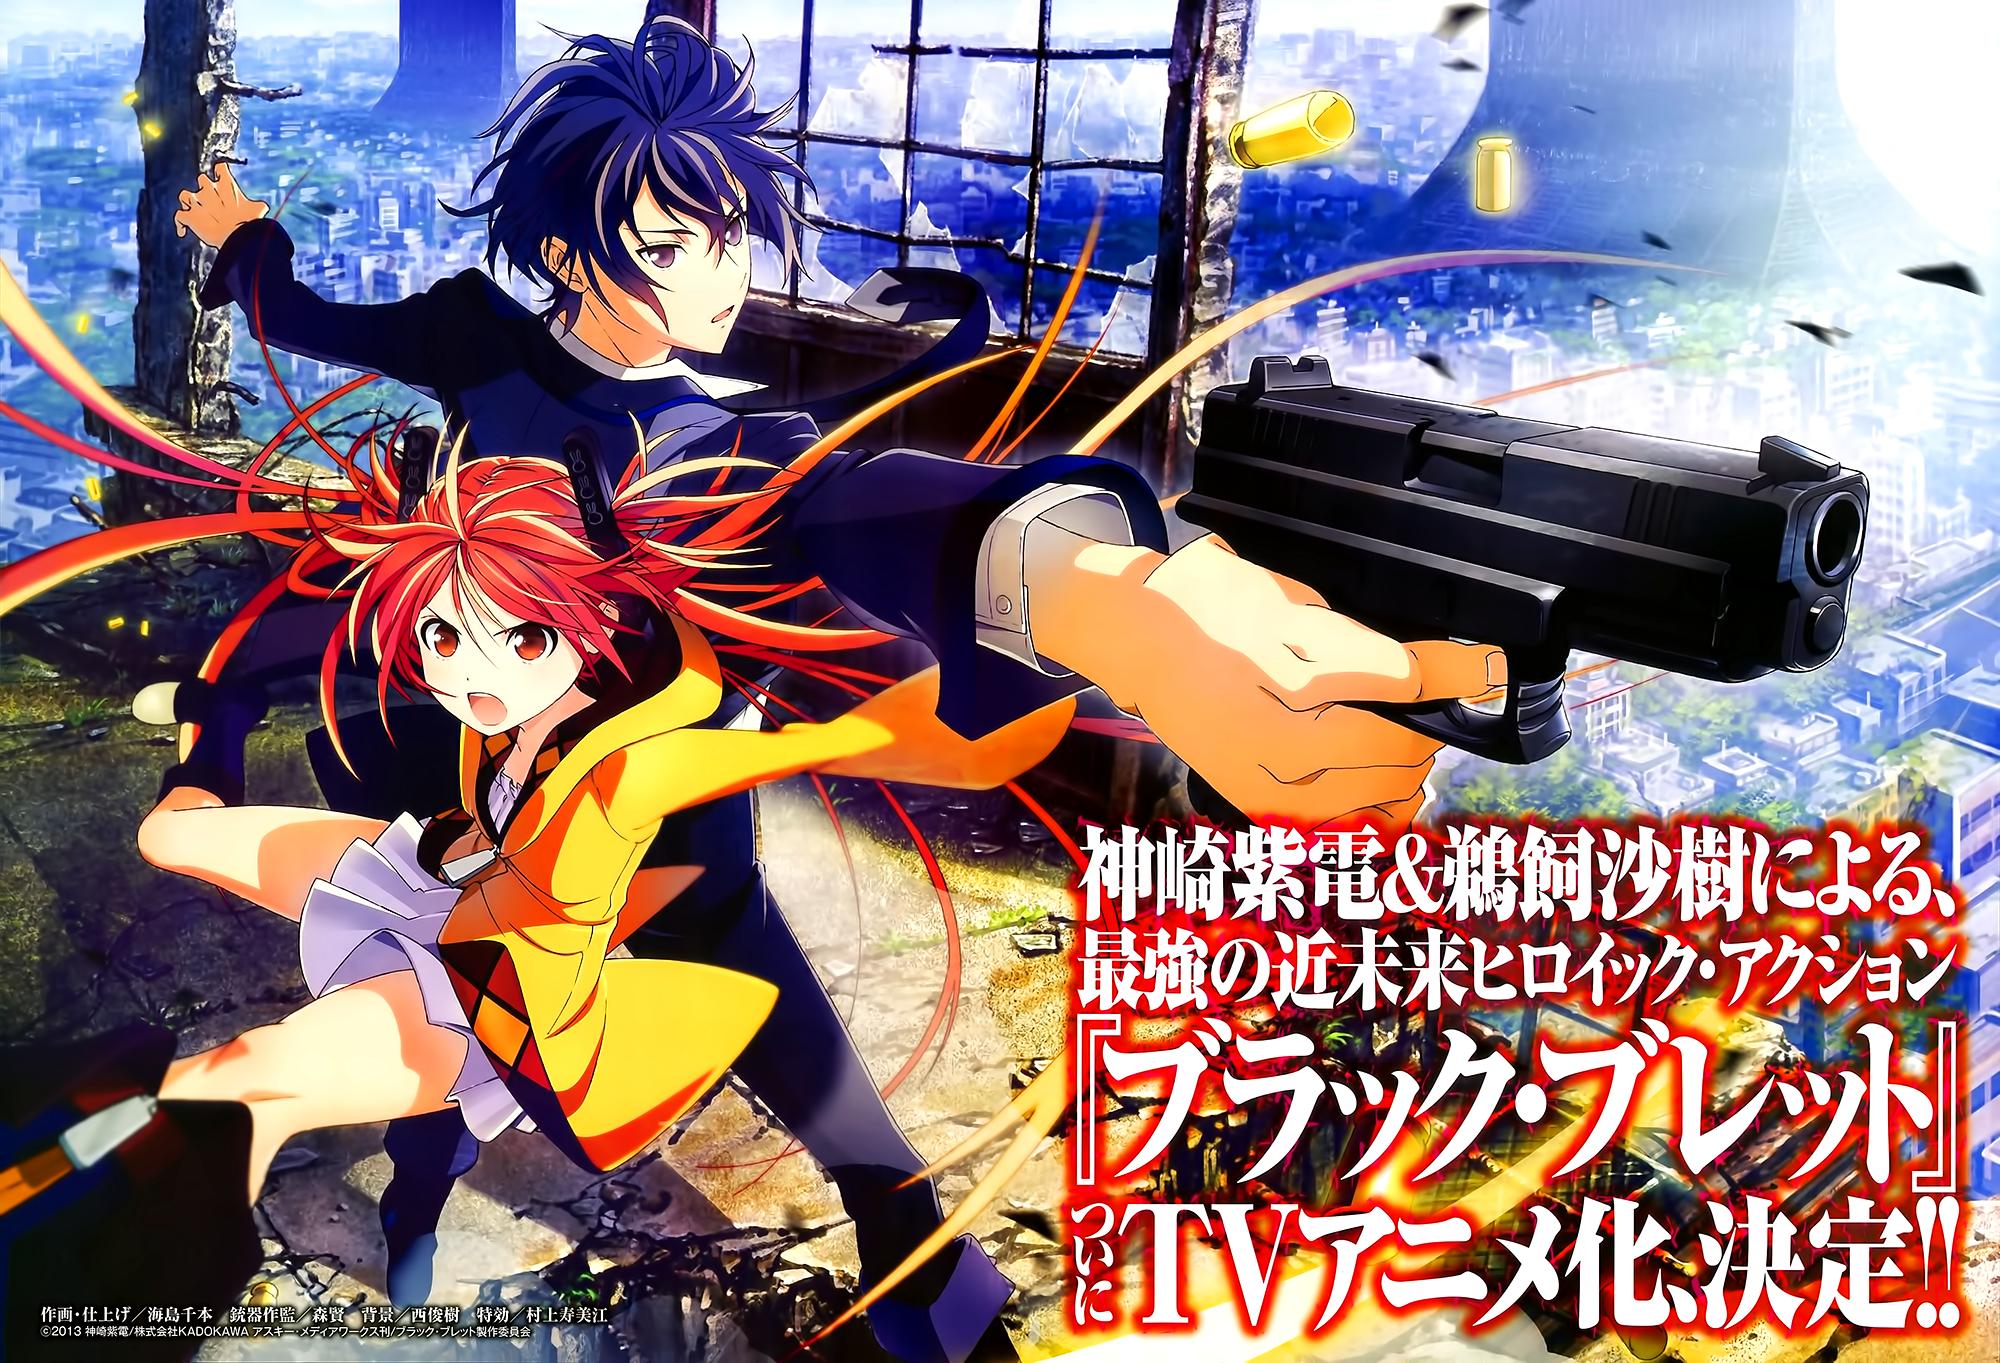 Image - <b>Black Bullet</b> Anime Promotional Poster.png - <b>Black Bullet</b> Wiki